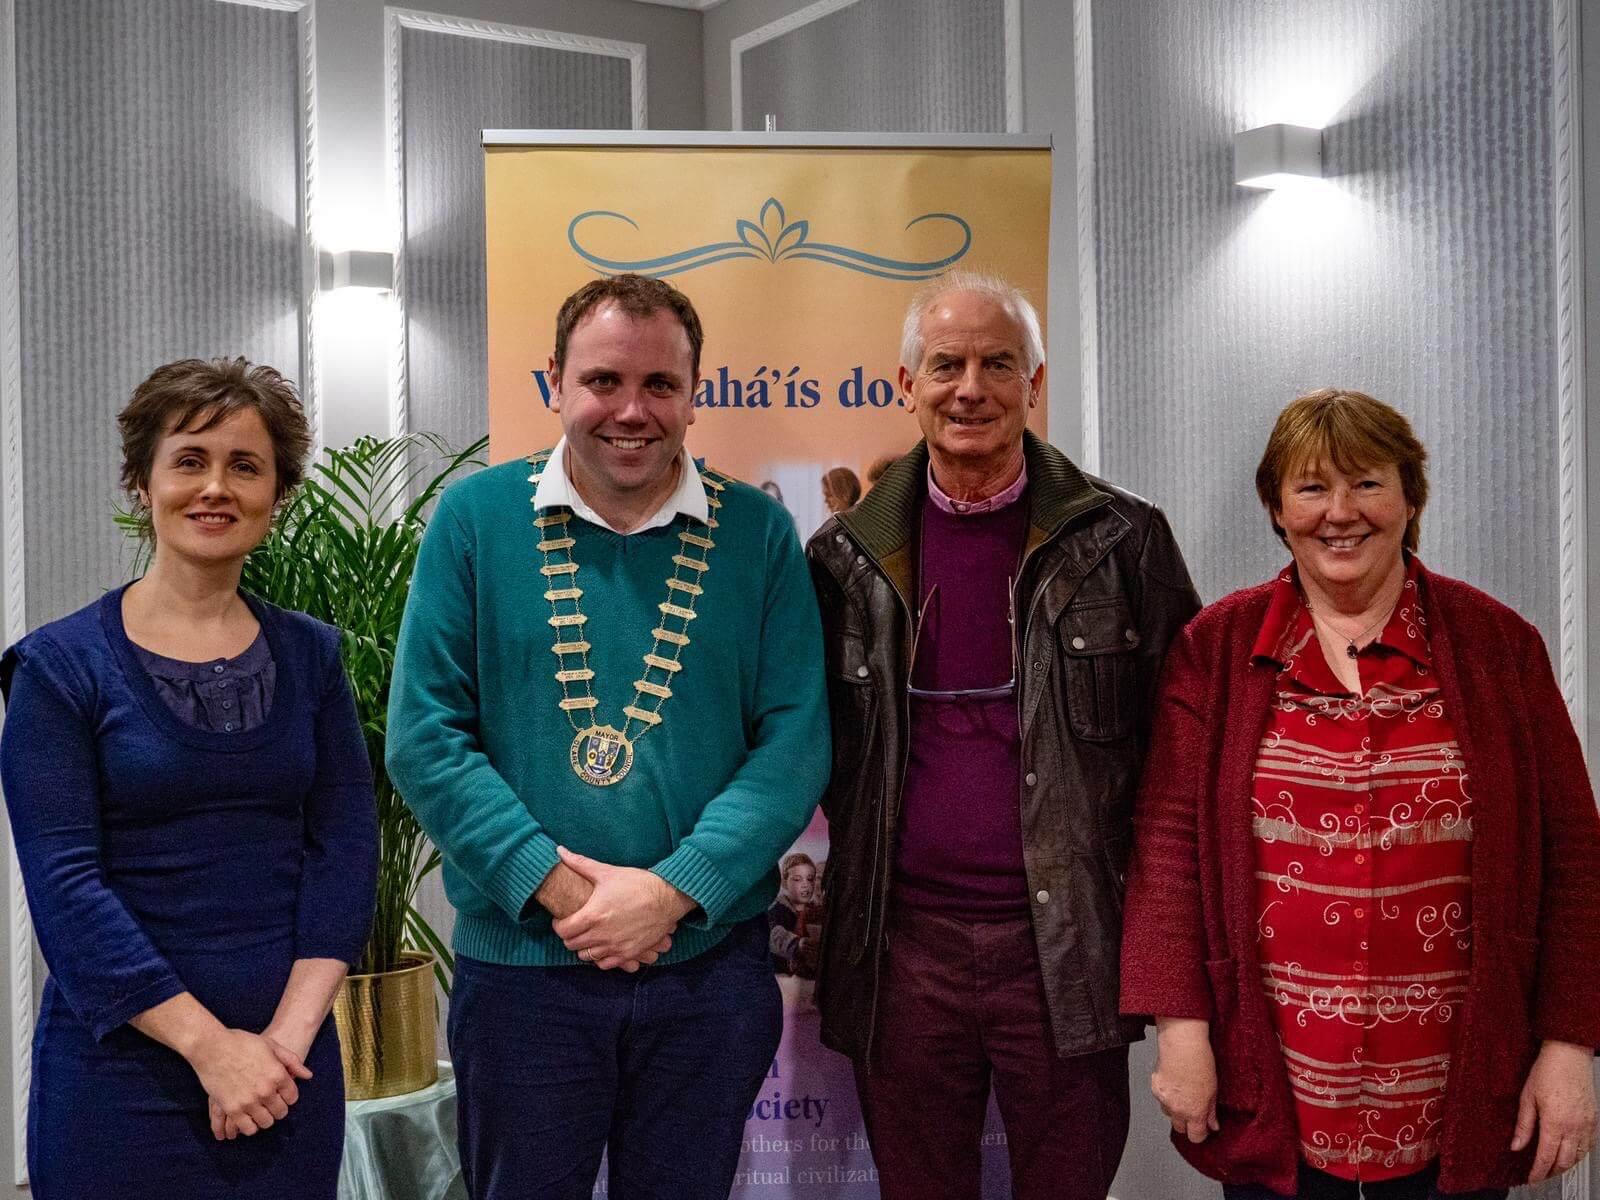 2019 Bicentenary events Ireland8